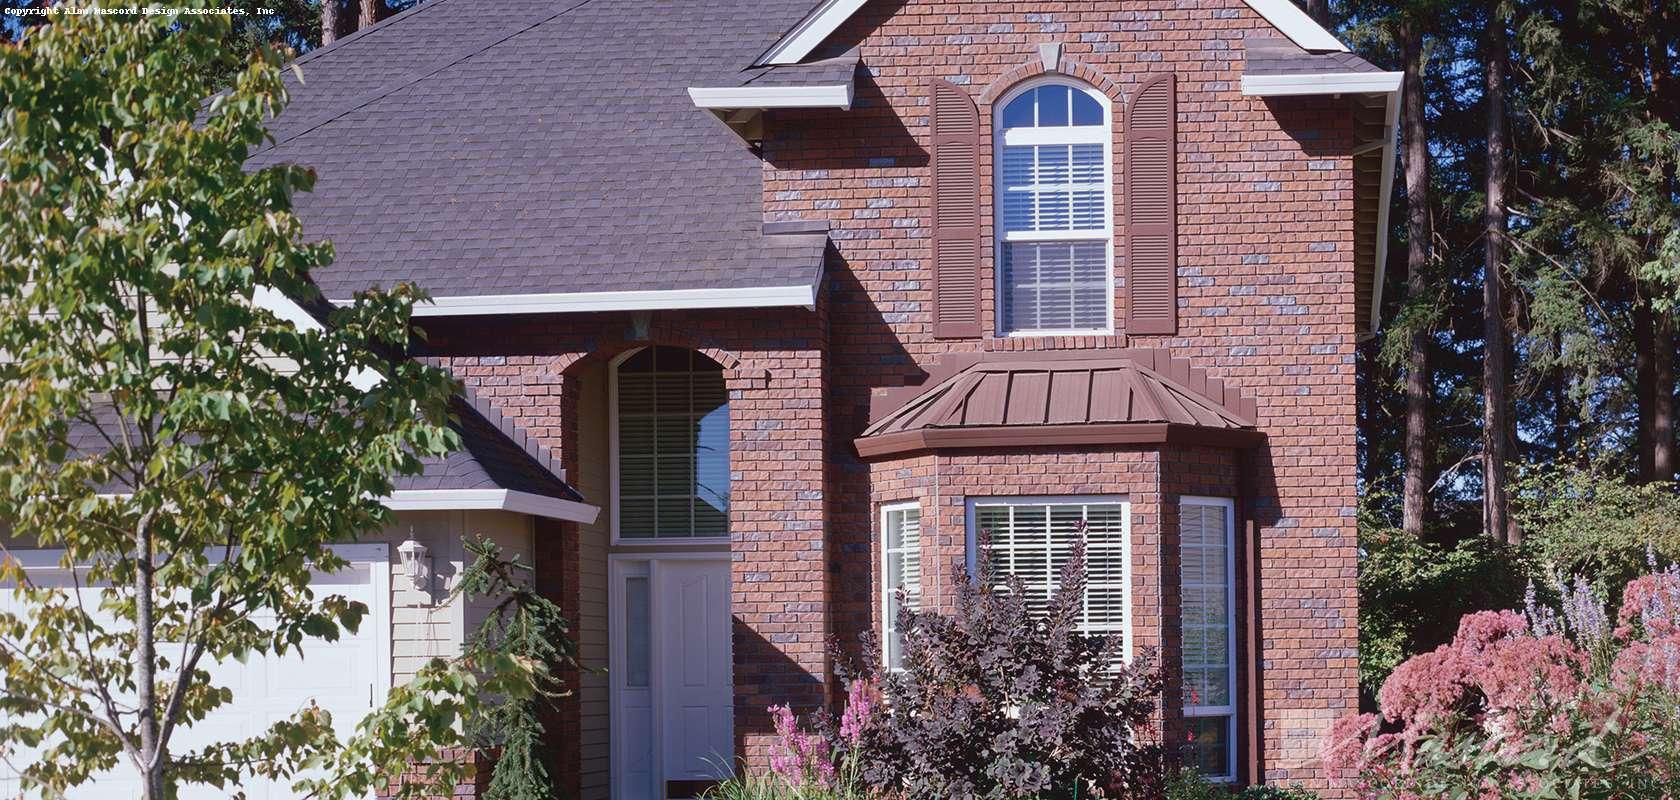 Mascord House Plan B2210: The Westbrook